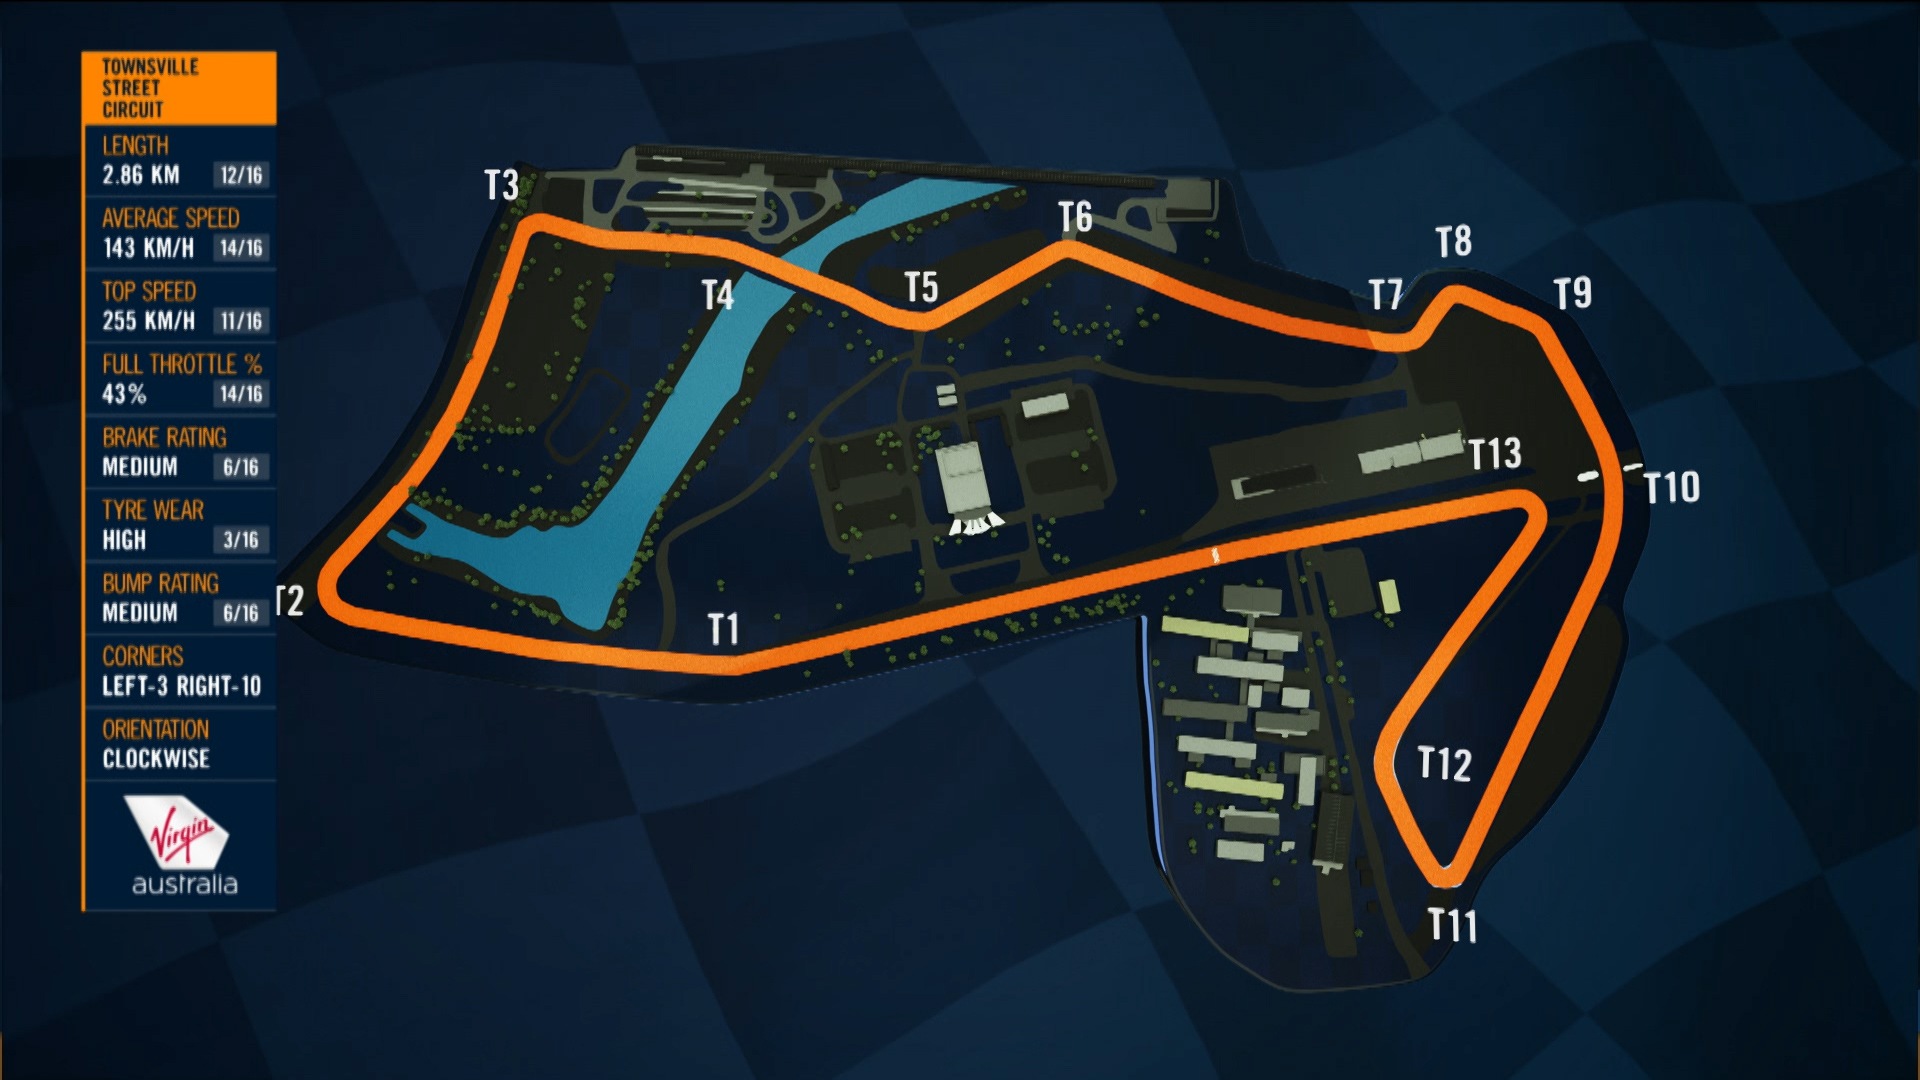 Virgin Australia Track Map Townsville Supercars